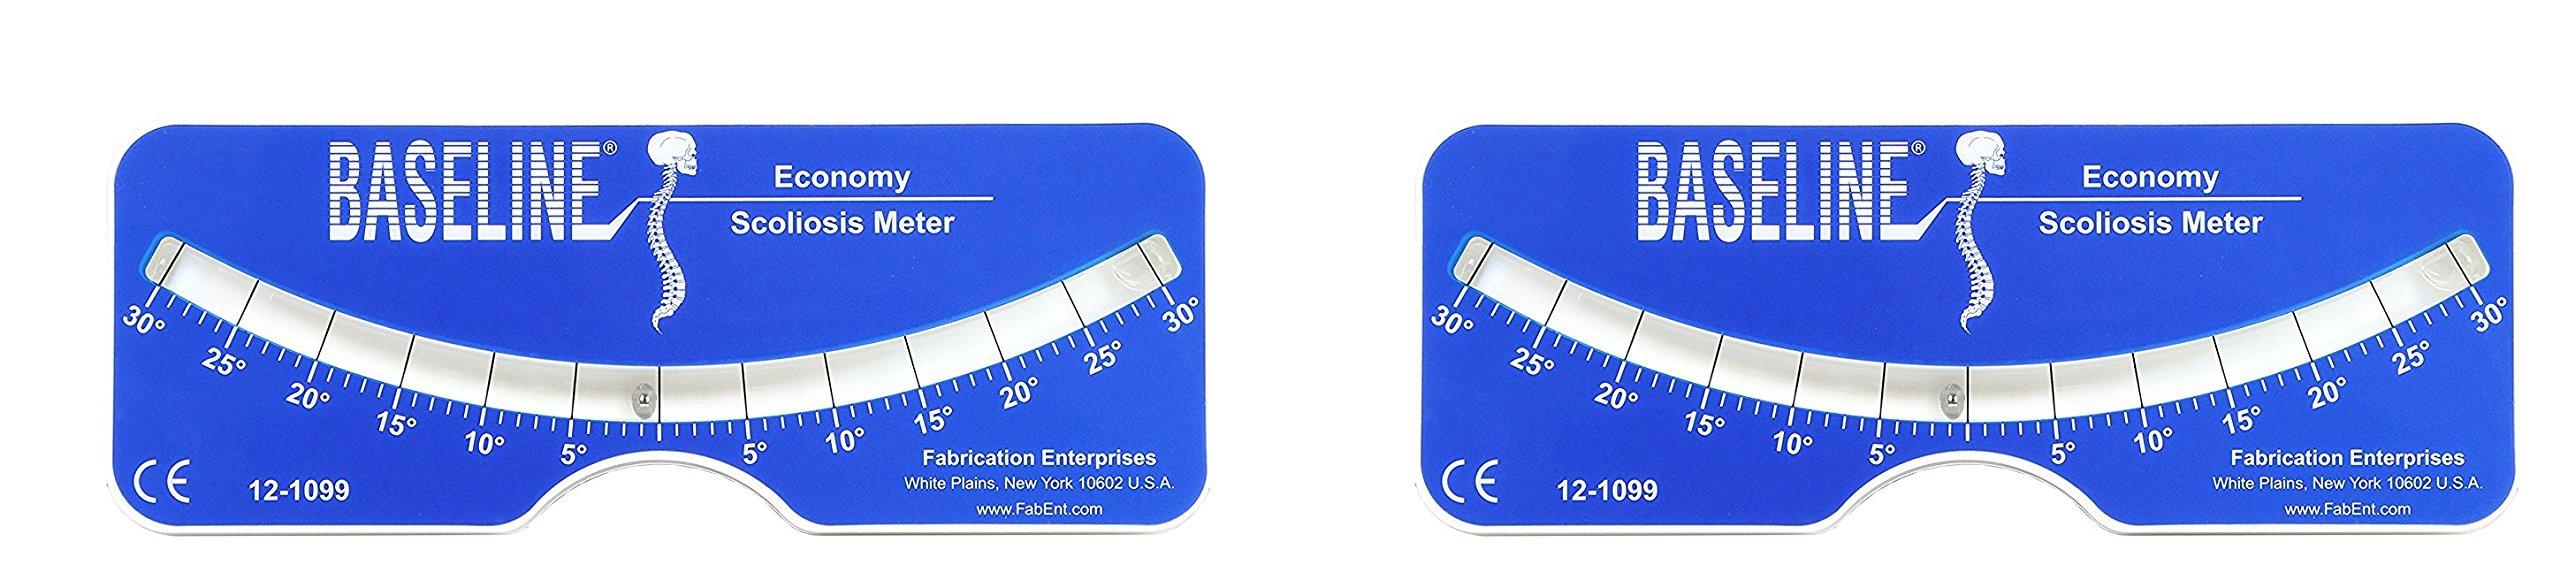 Baseline 12-1099 Scoliosis Meter, Plastic Economy (2 pack)